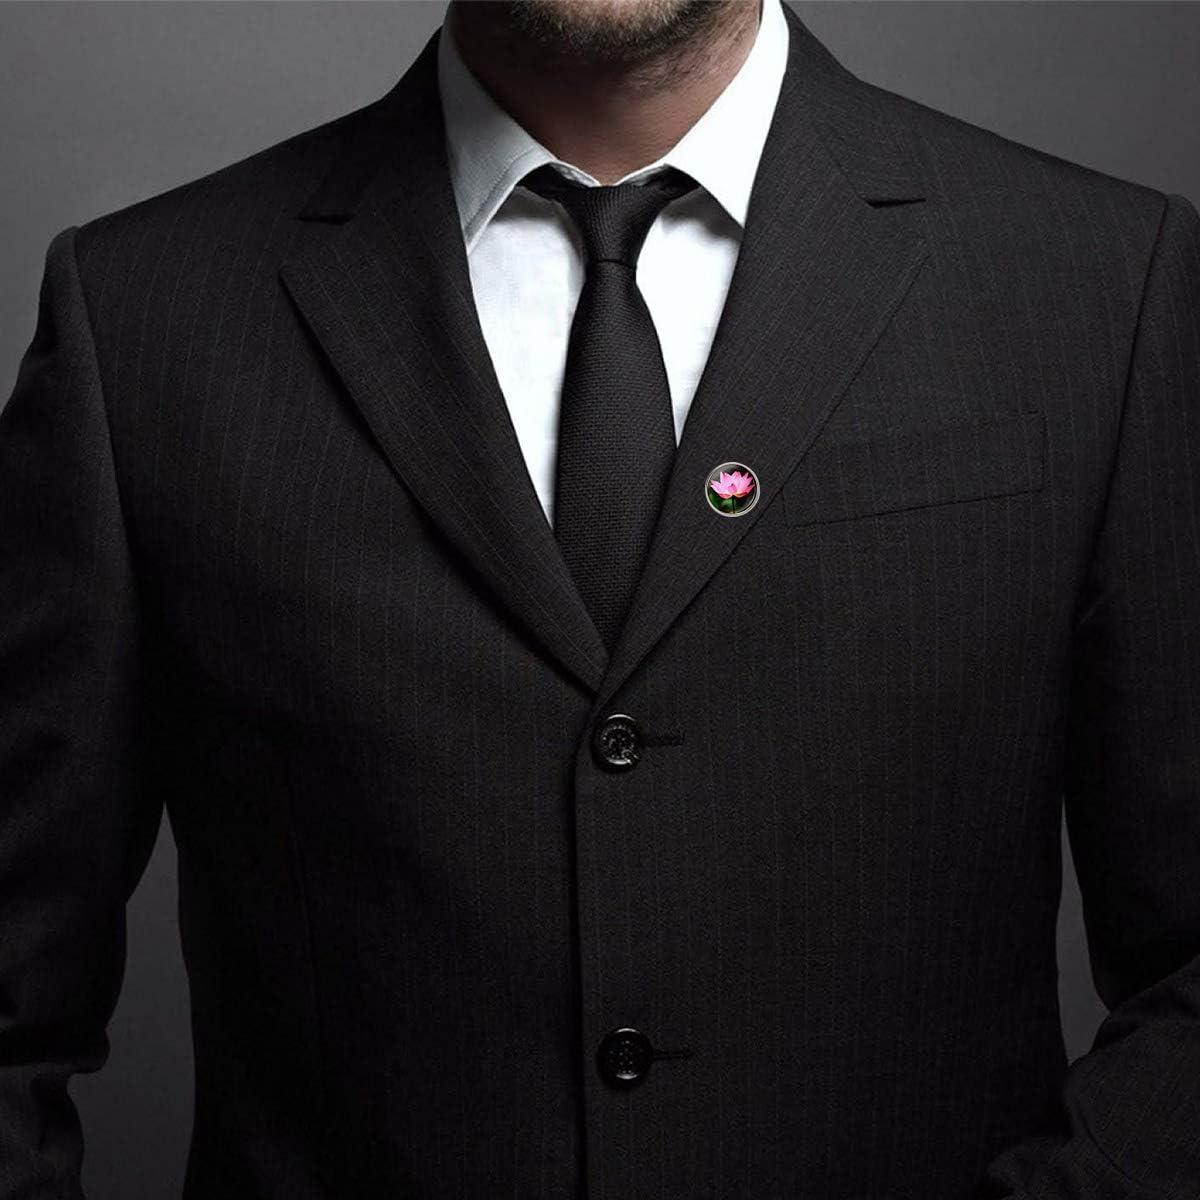 WAZZIT Round Metal Tie Tack Hat Lapel Pin Brooches Pink Lotus Art Banquet Badge Enamel Pins Trendy Accessory Jacket T-Shirt